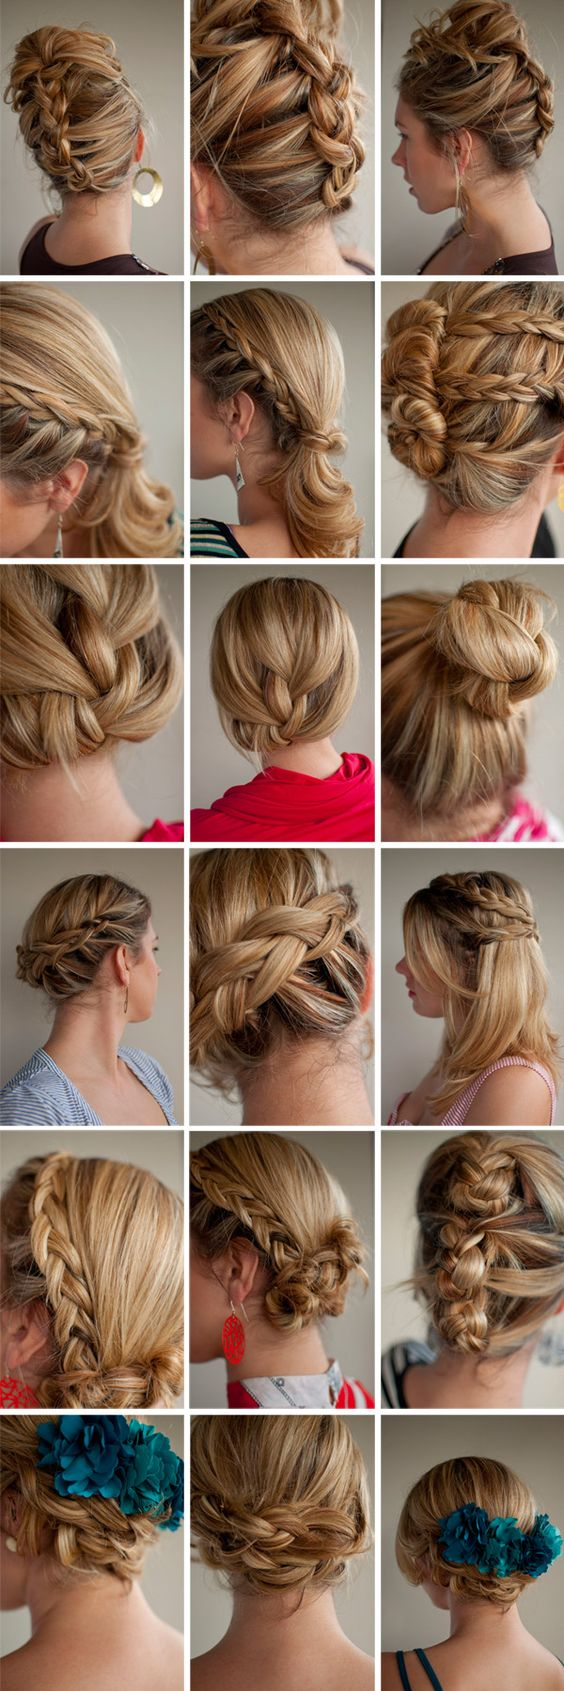 15 variations of braids